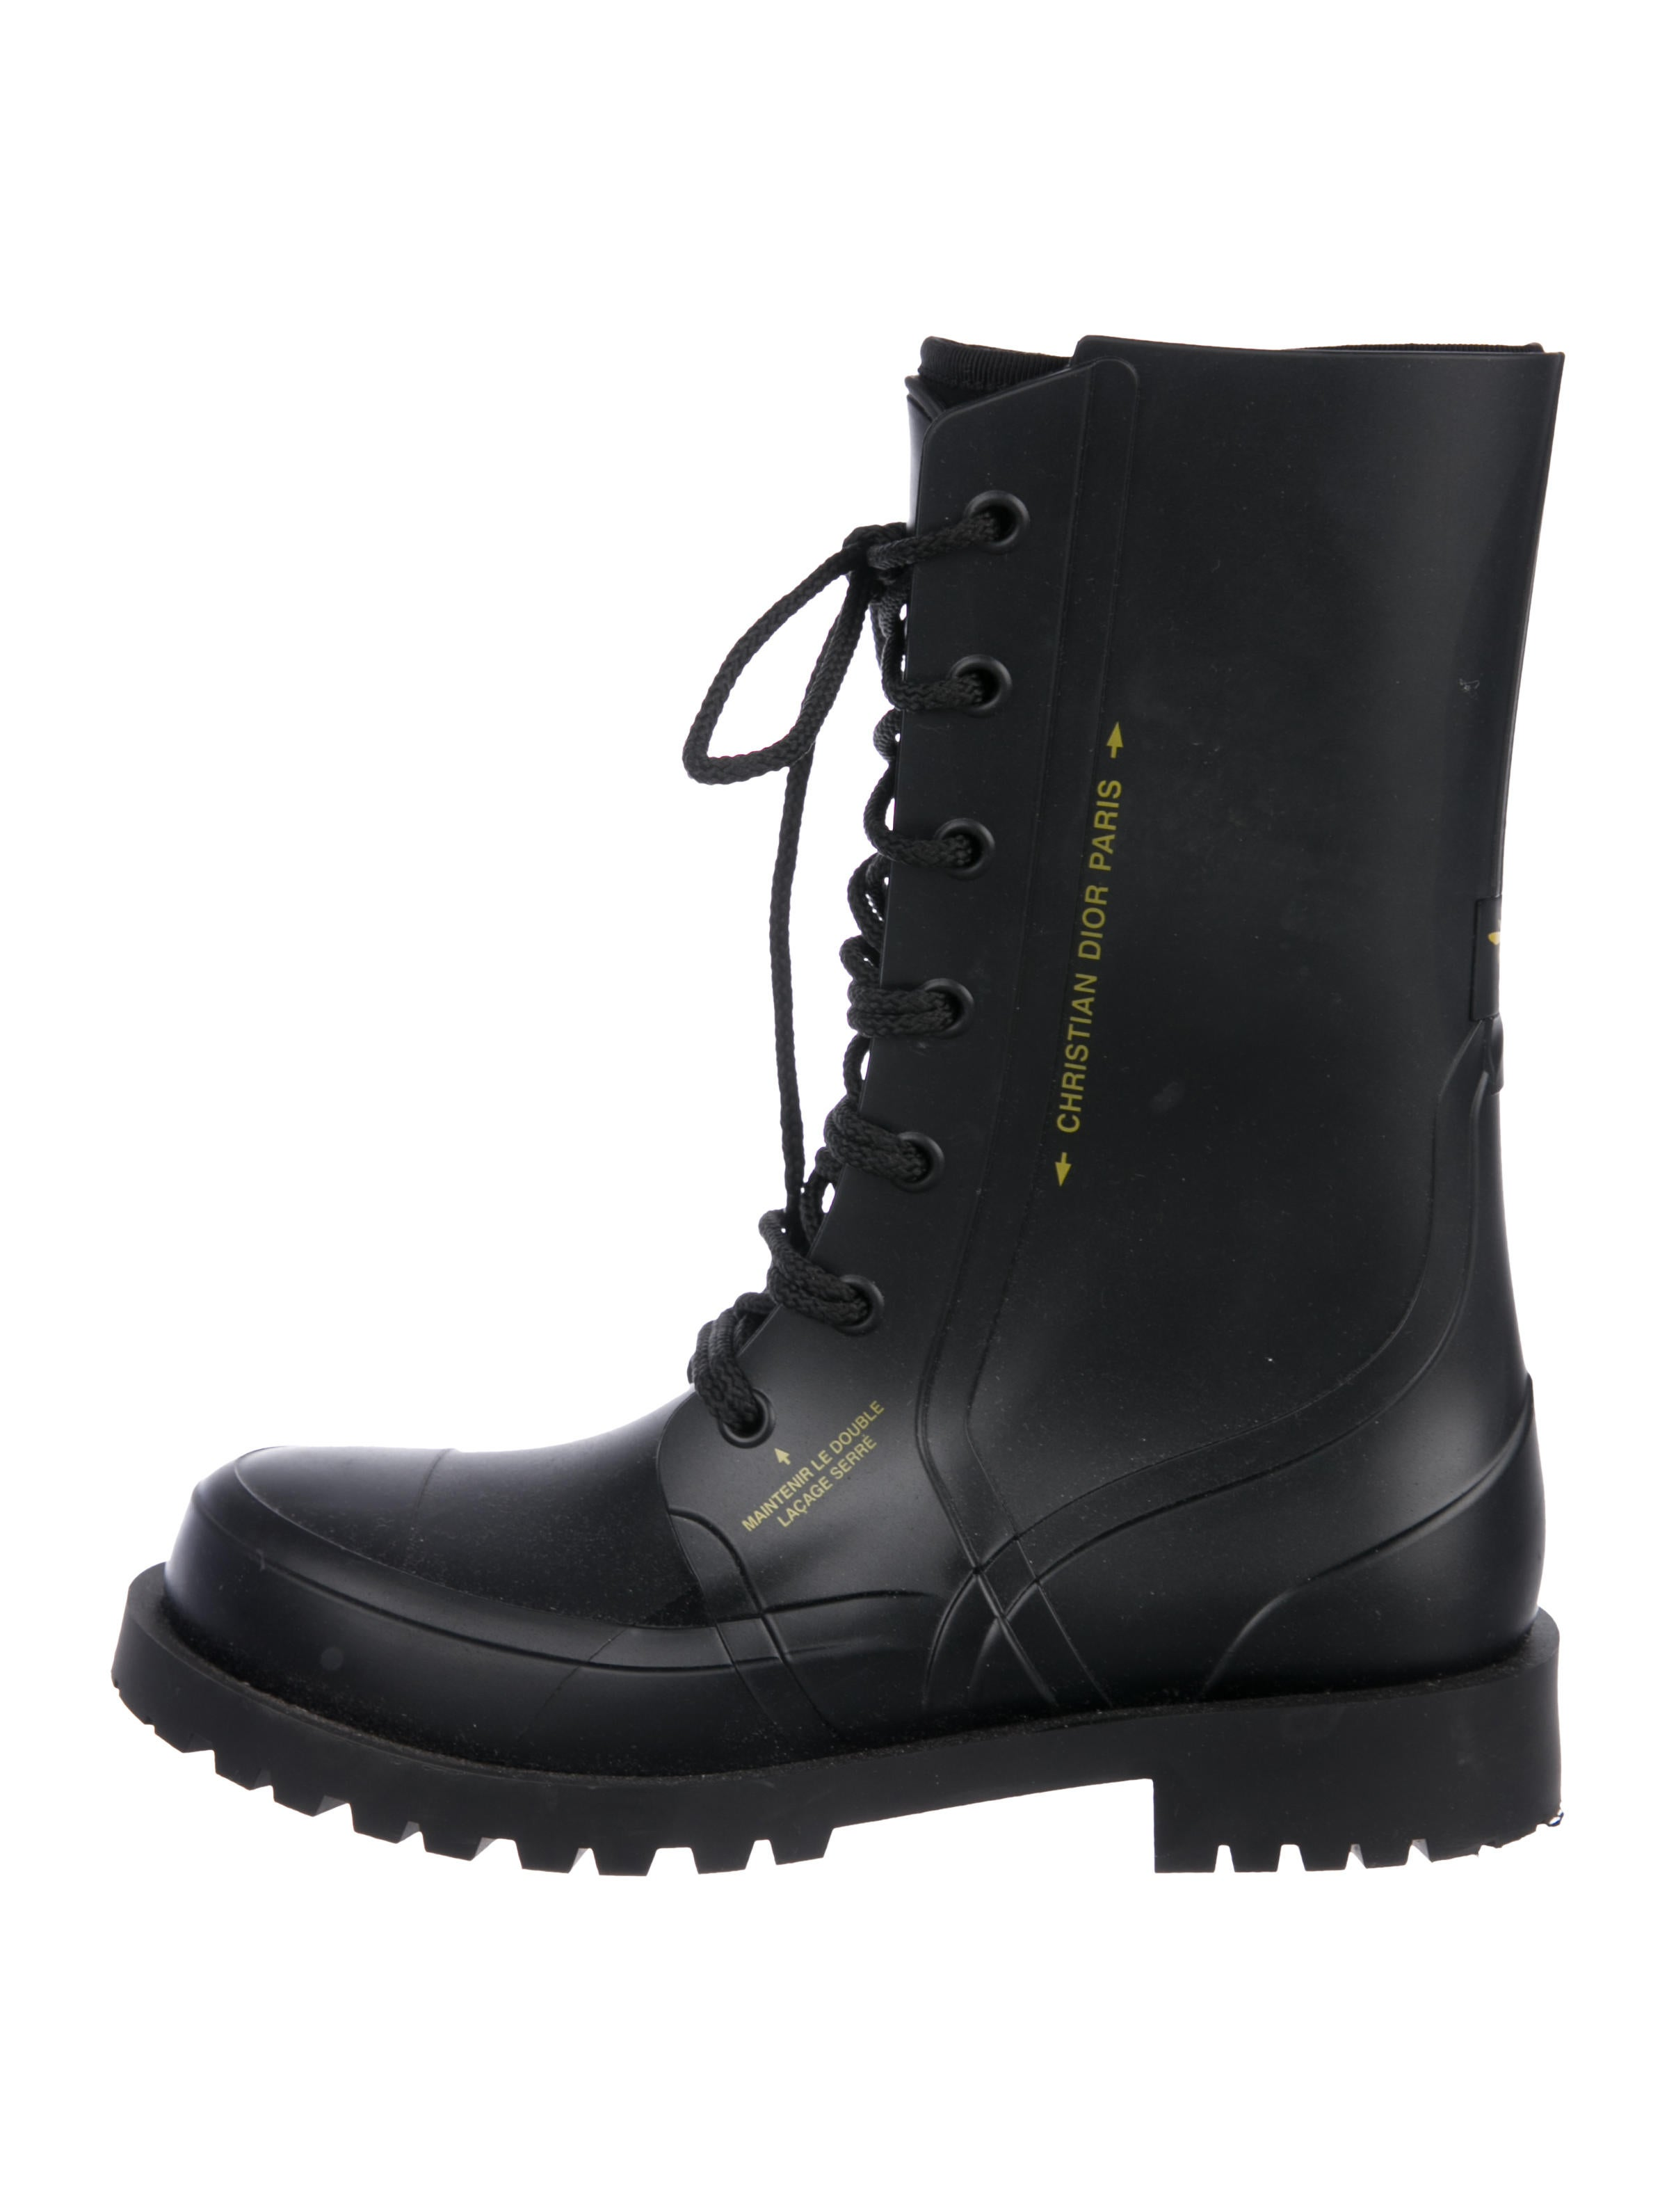 Christian Dior 2019 Diorcamp Rain Boots